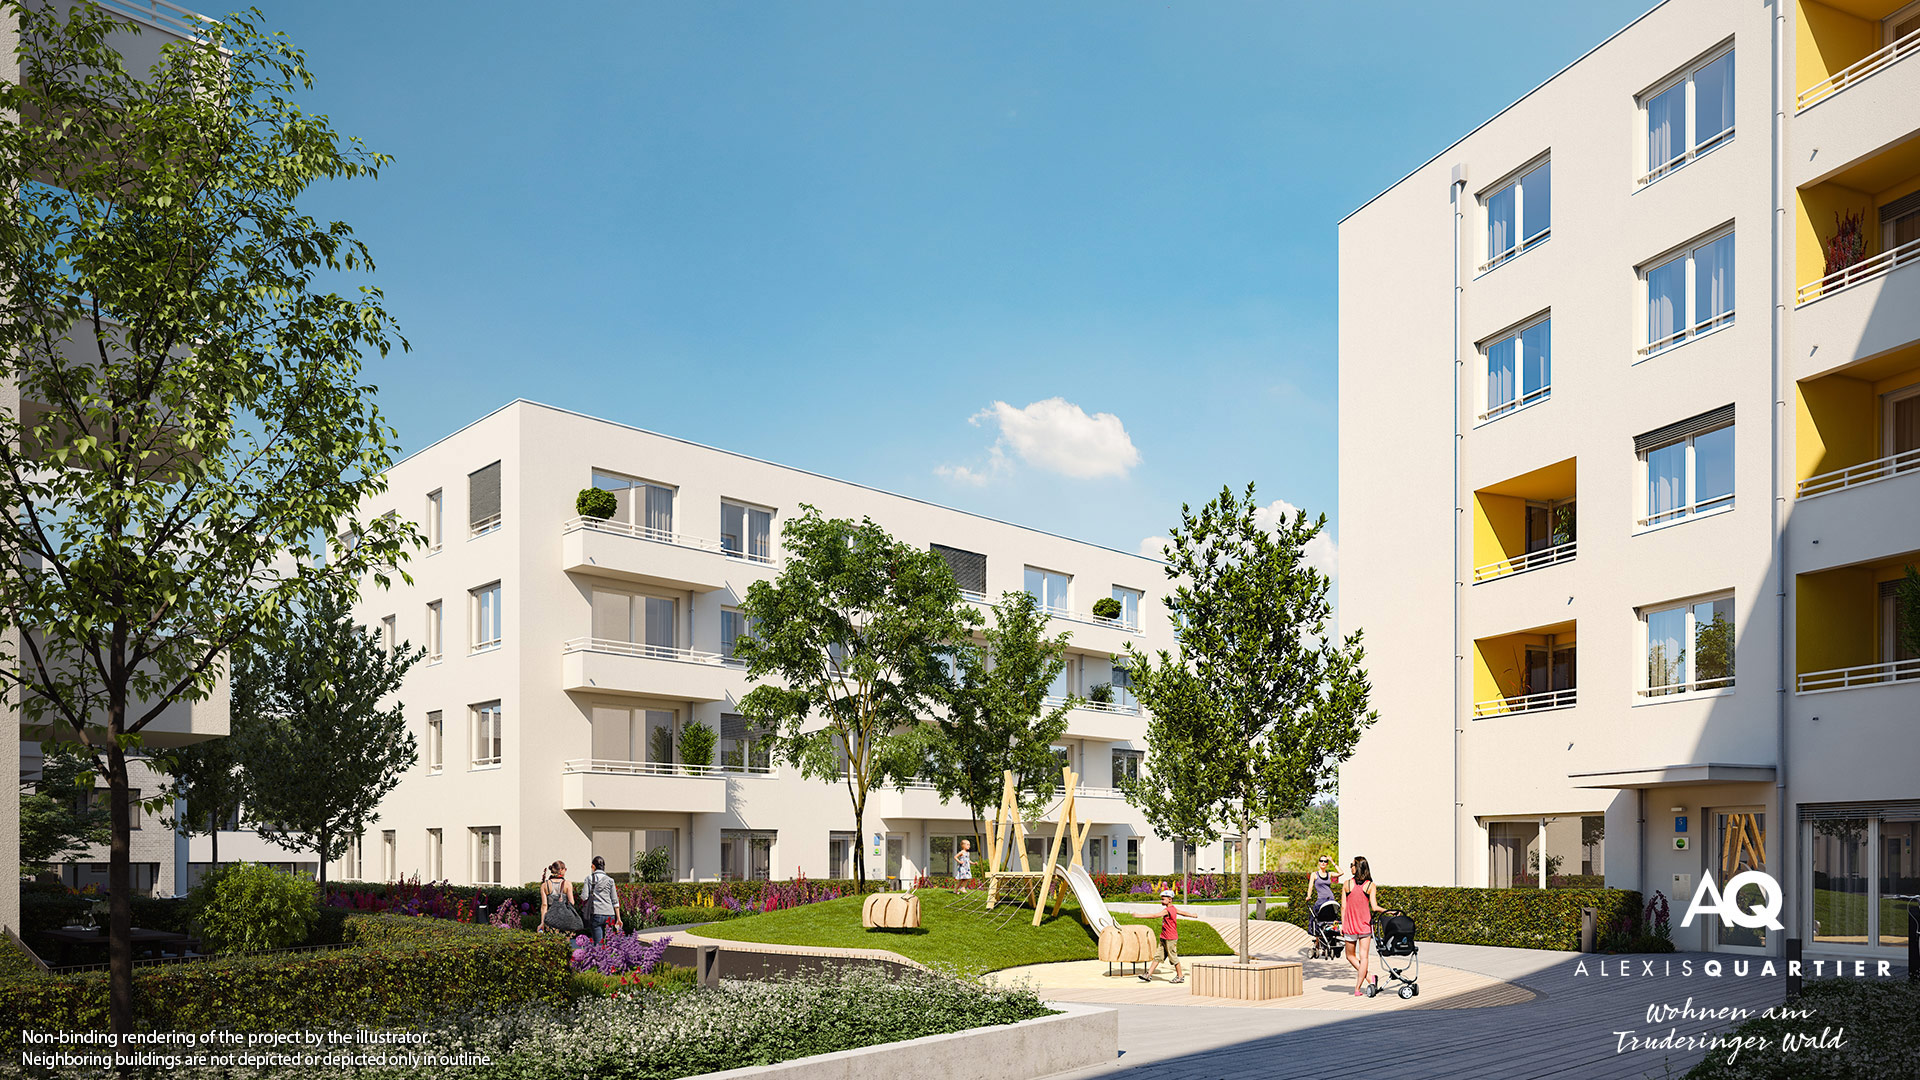 Property Alexisquartier - Wohnen am Truderinger Wald - Illustration 4